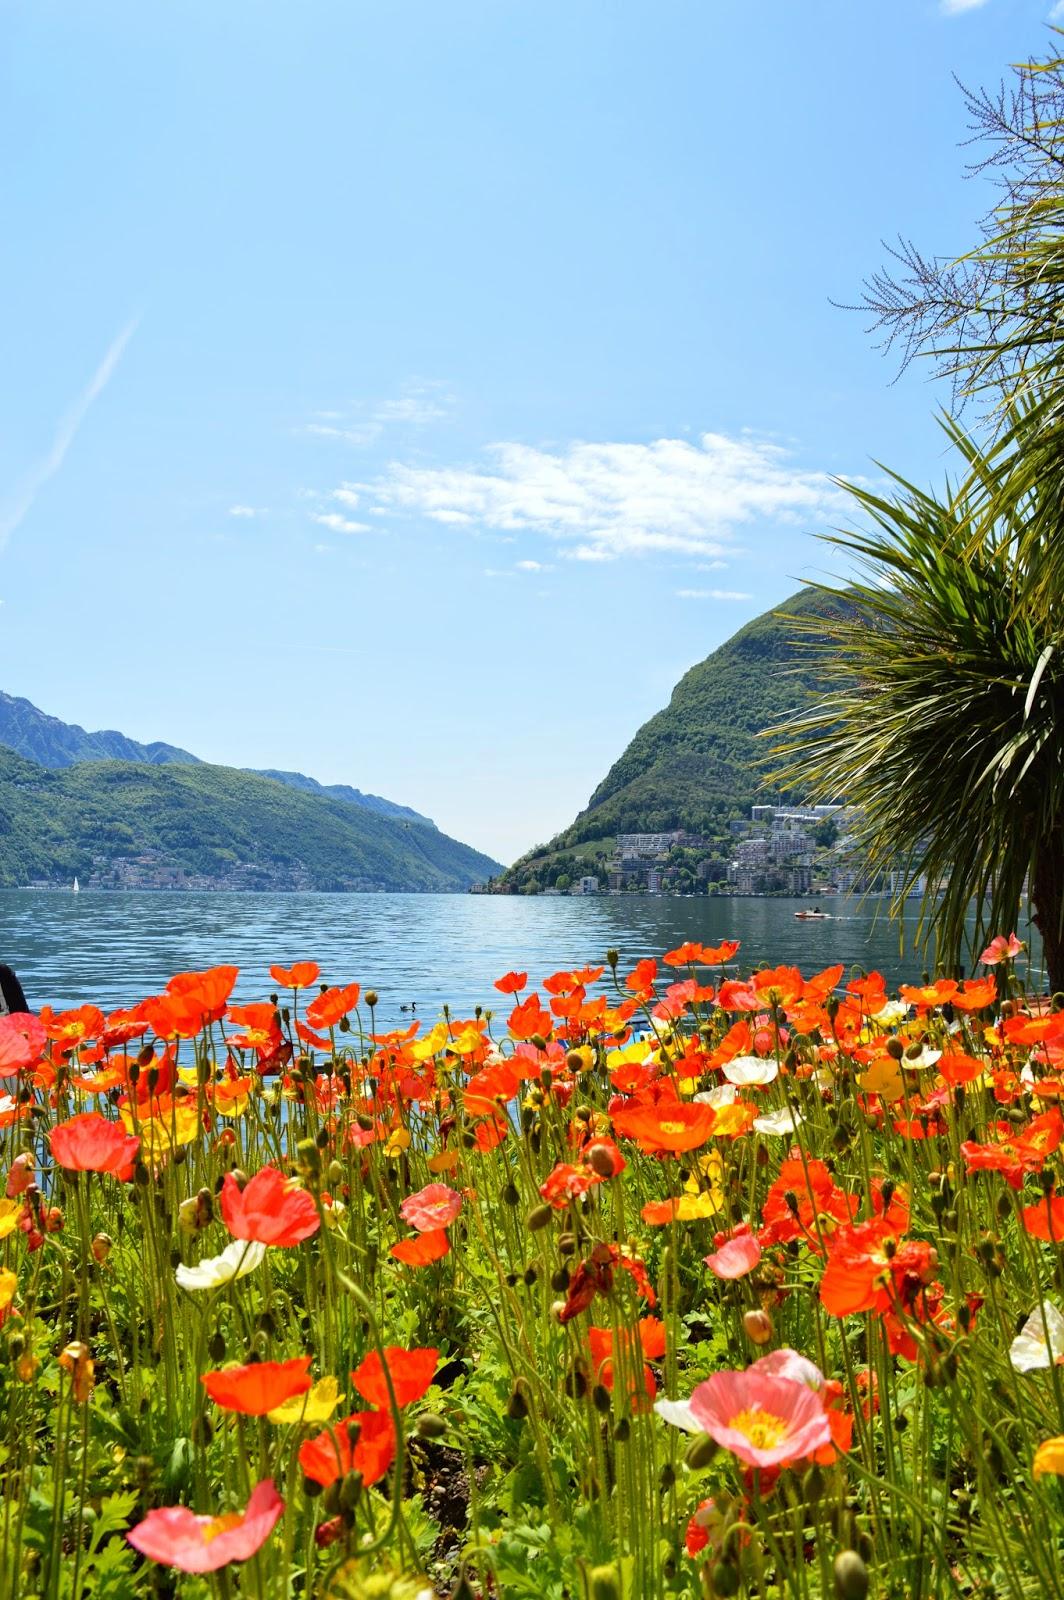 Lake Lugano and Monte San Salvatore, http://sleachmouradventures.blogspot.com